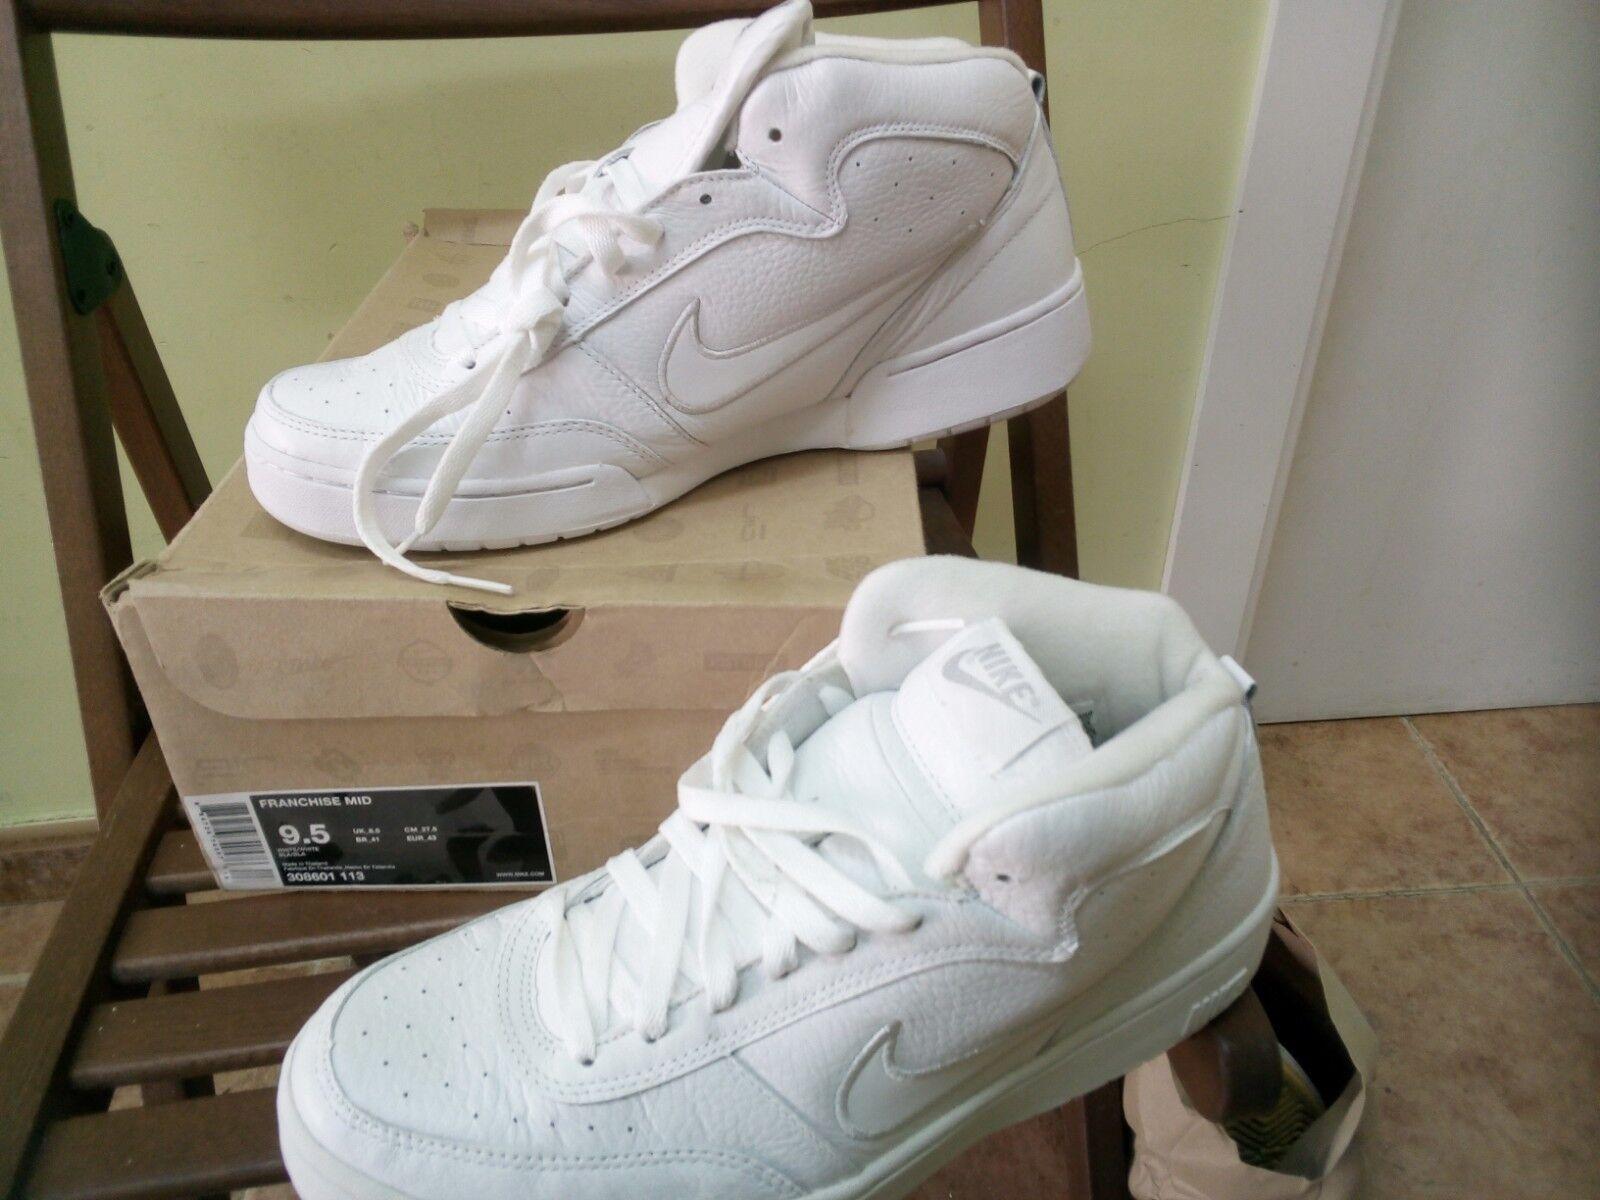 Nike 9,5 franchise mitte sz 9,5 Nike (43) basketball - kraft 7cb543